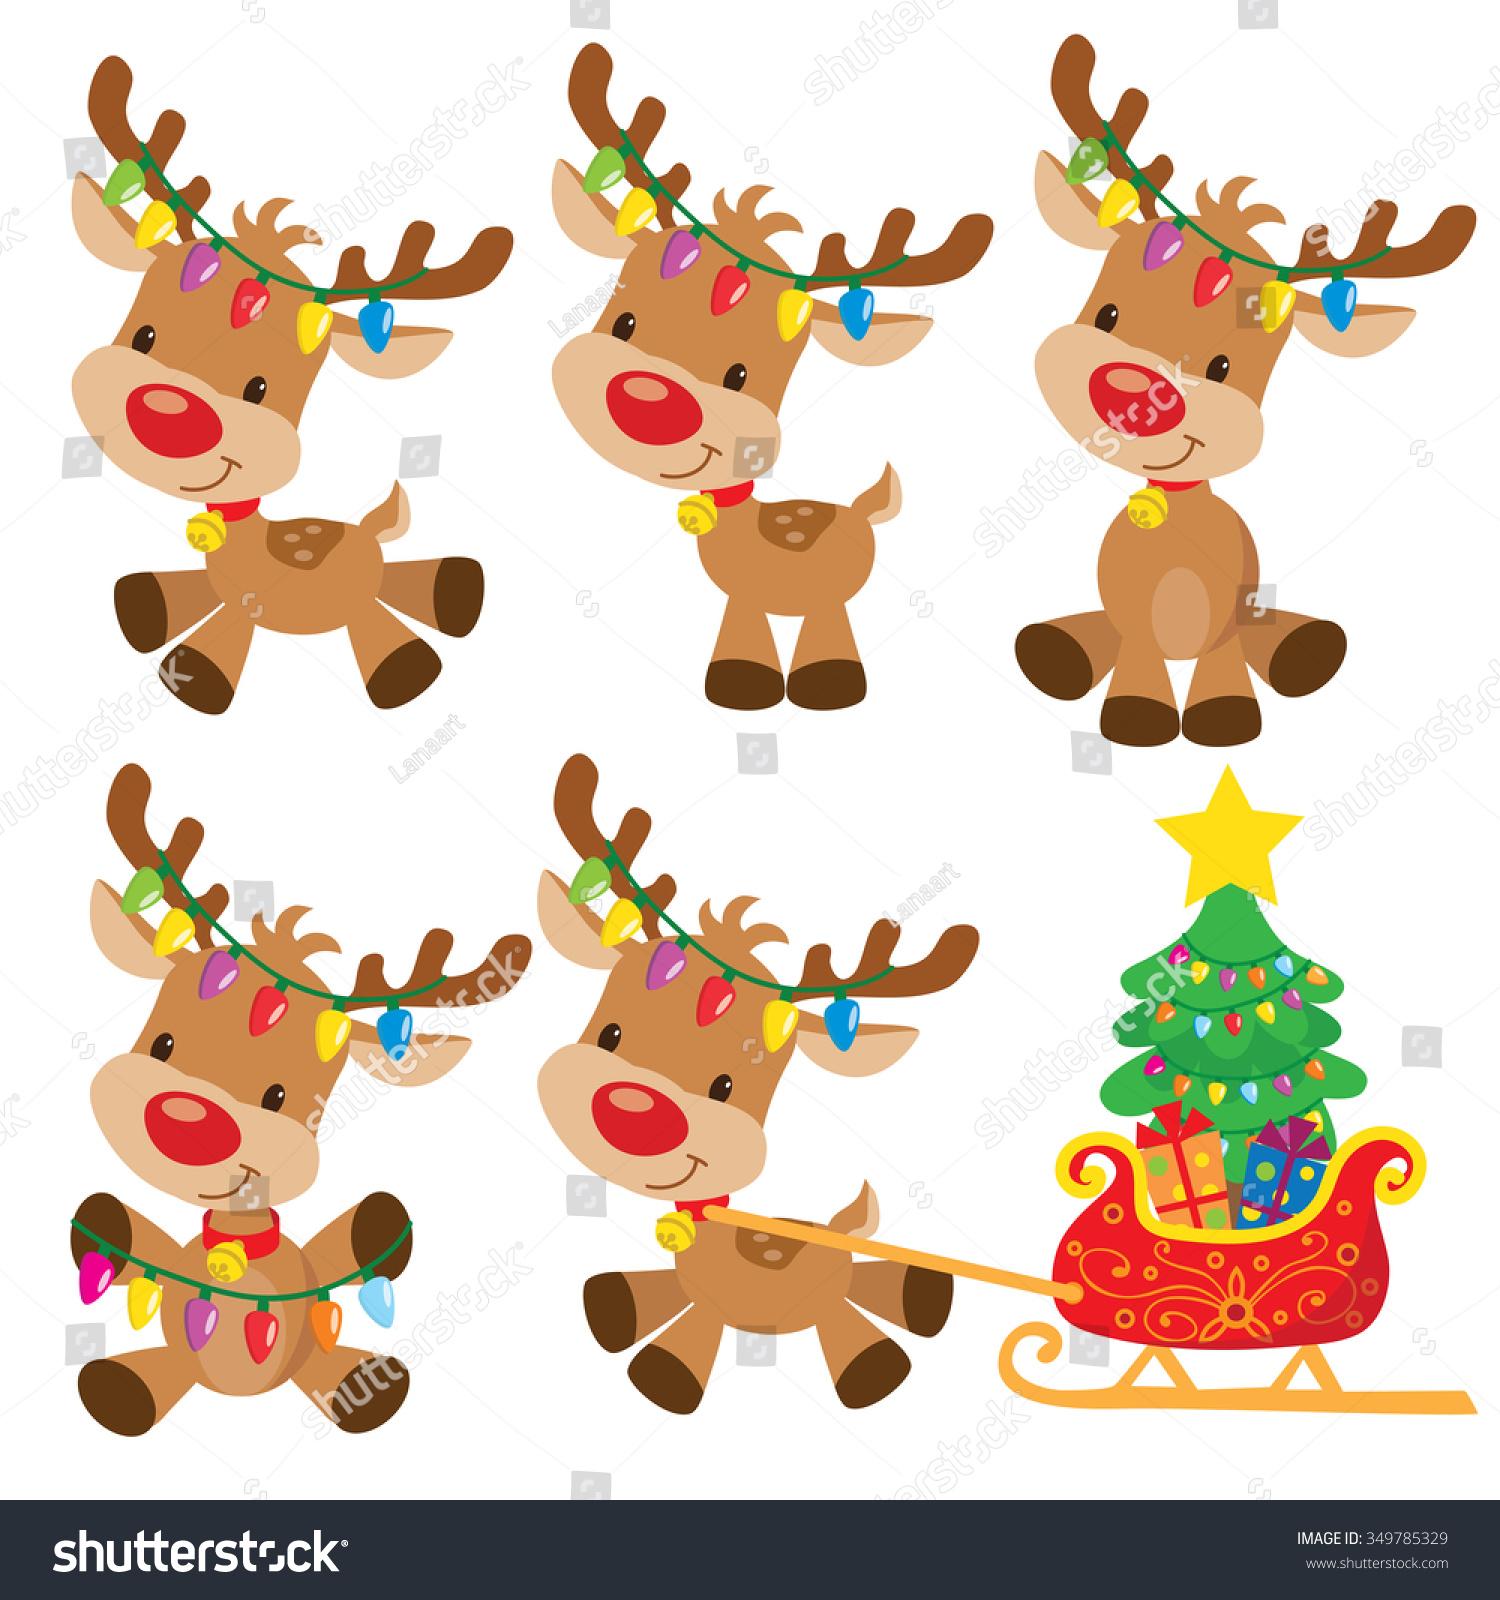 Christmas Reindeer Vector Illustration - 349785329 ...